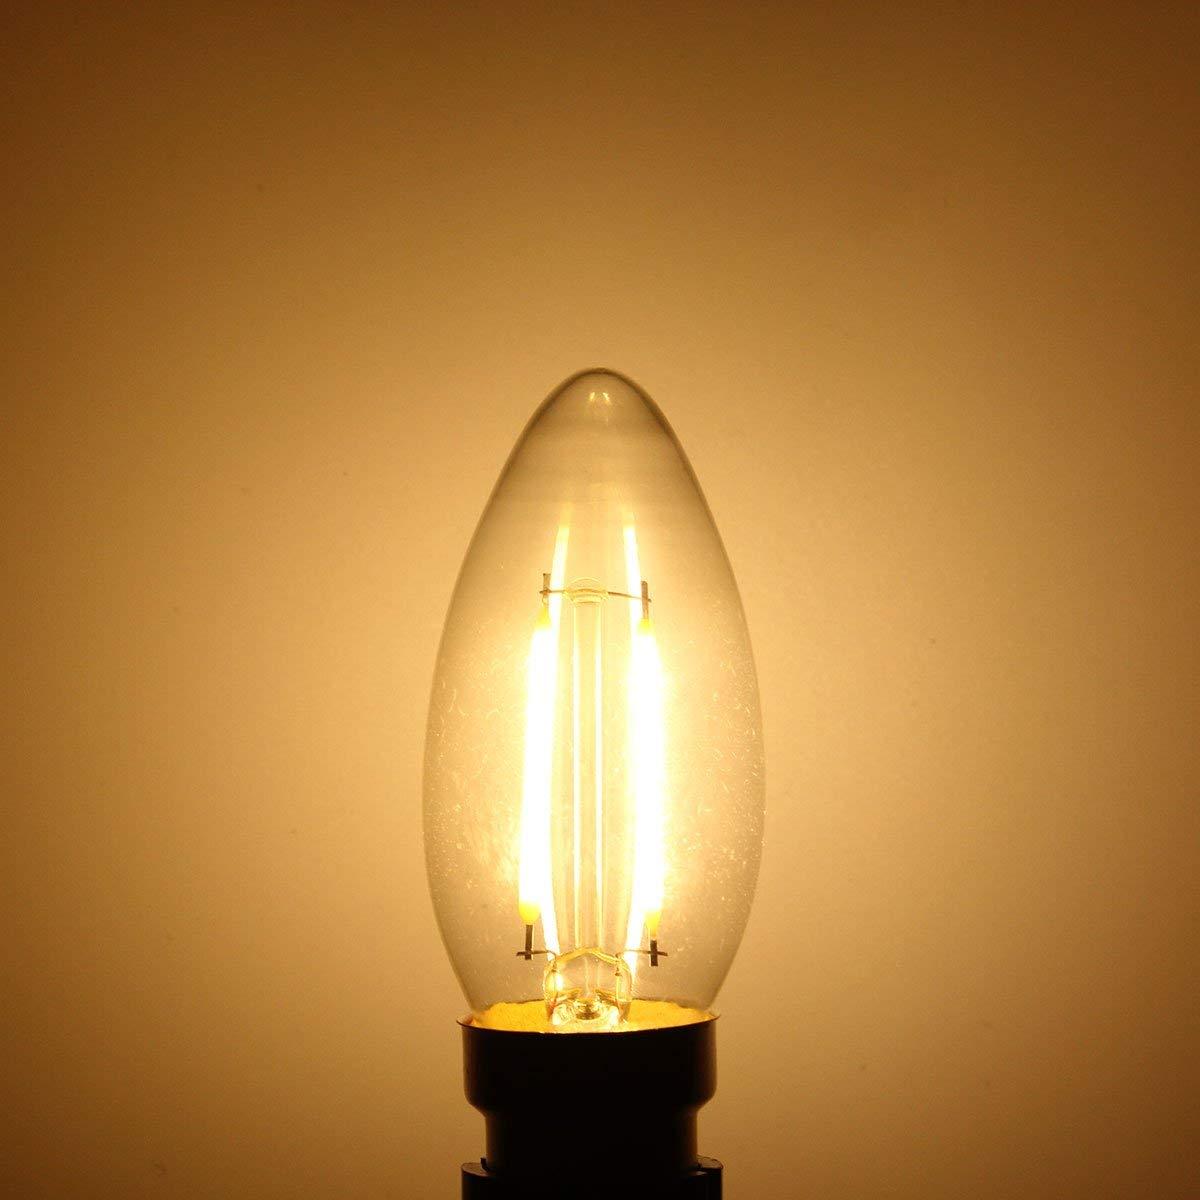 Lights & Lighting - Dimmable B22 C35 2w Retro Cob Filament 200lm Vintage Edison Light Bulb Ac220v - B22 Light Bulb Led Bulbs Watt Candelabra Equivalent 120v Chandelier - 100 - 1PCs